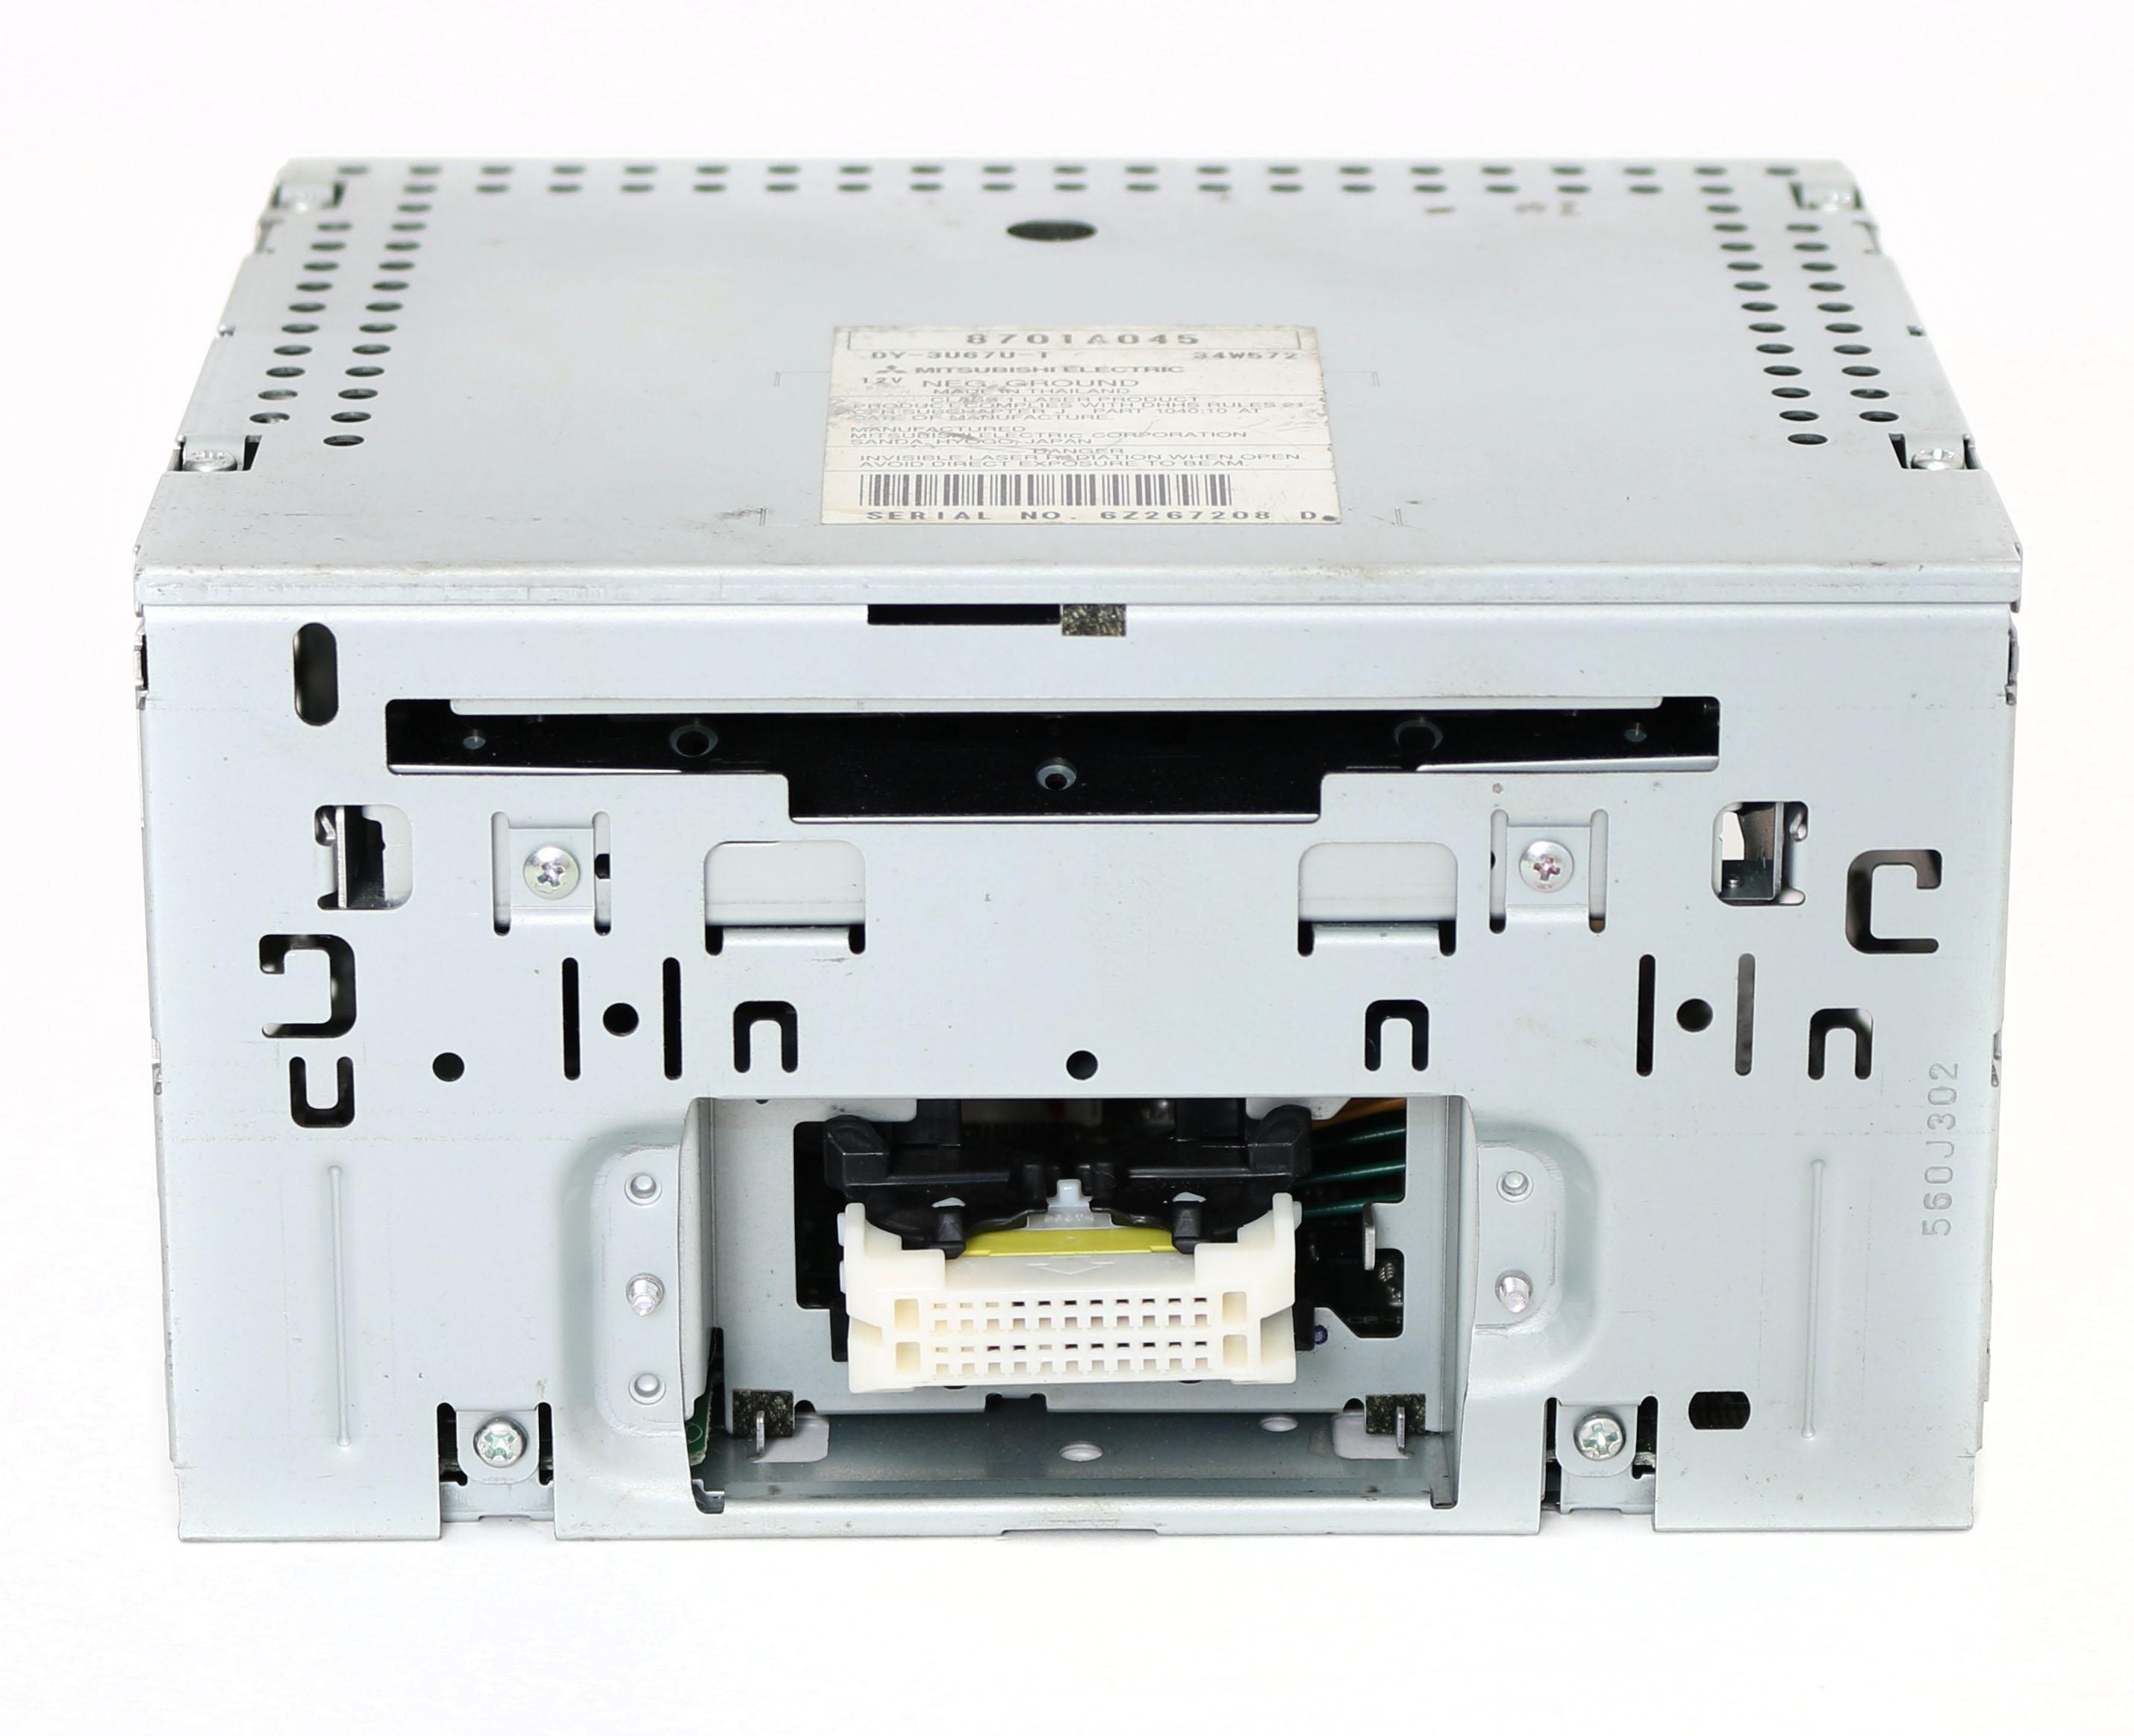 Mitsubishi 2006-2009 Eclipse Endeavor Galant AM FM Radio mp3 Single CD 8701A045 Refurbished by Mitsubishi